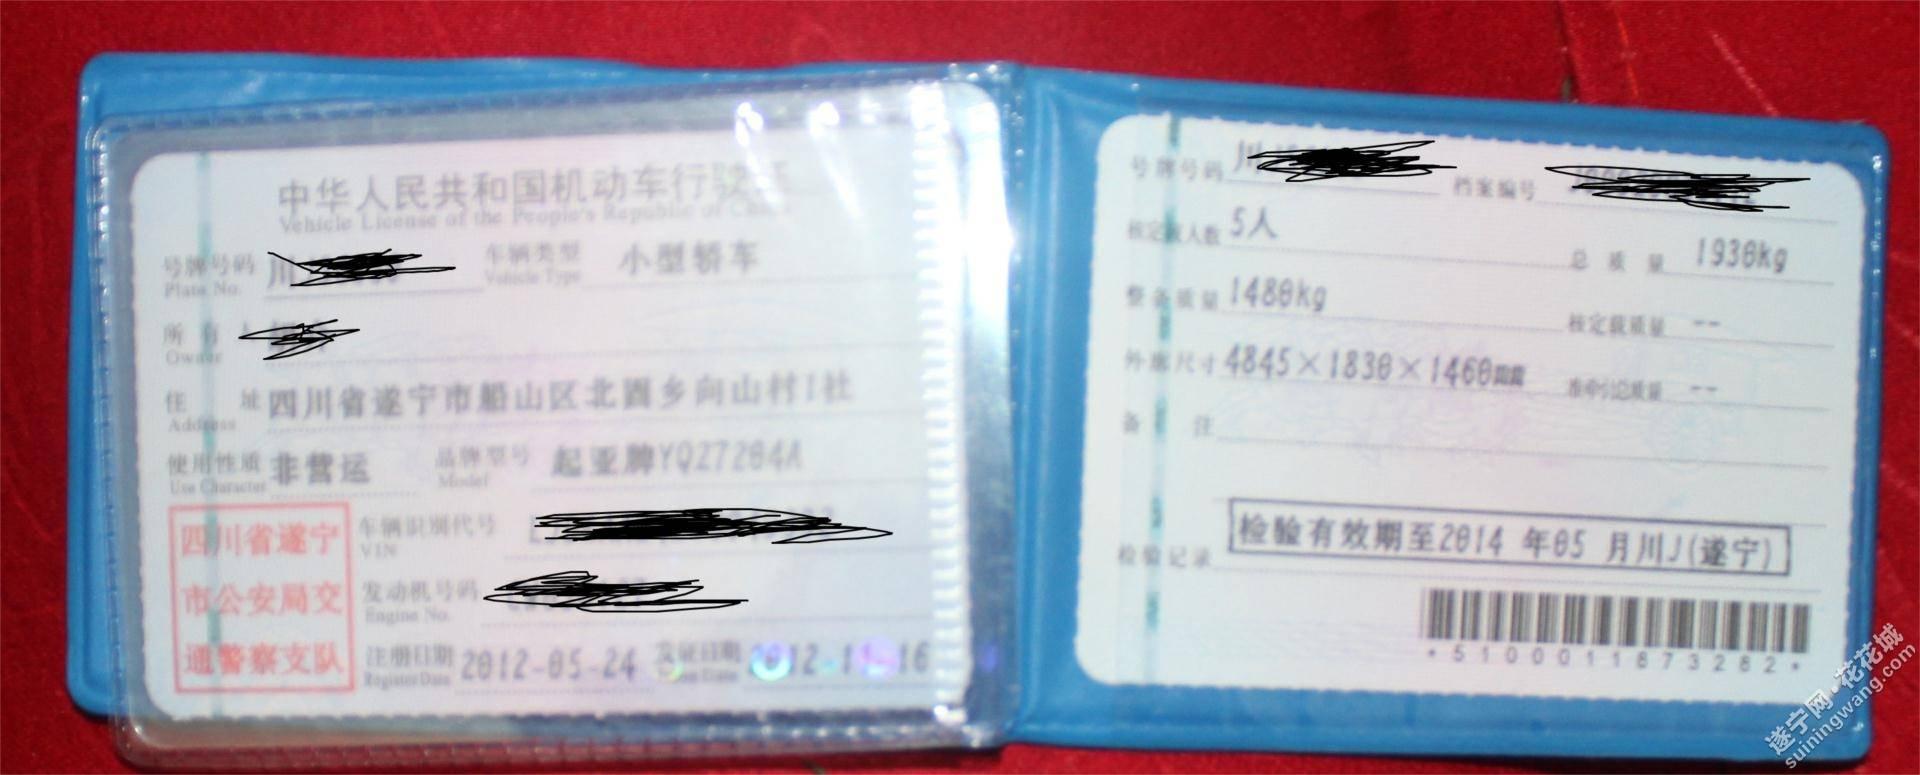 IMG_4109_2345看图王.JPG